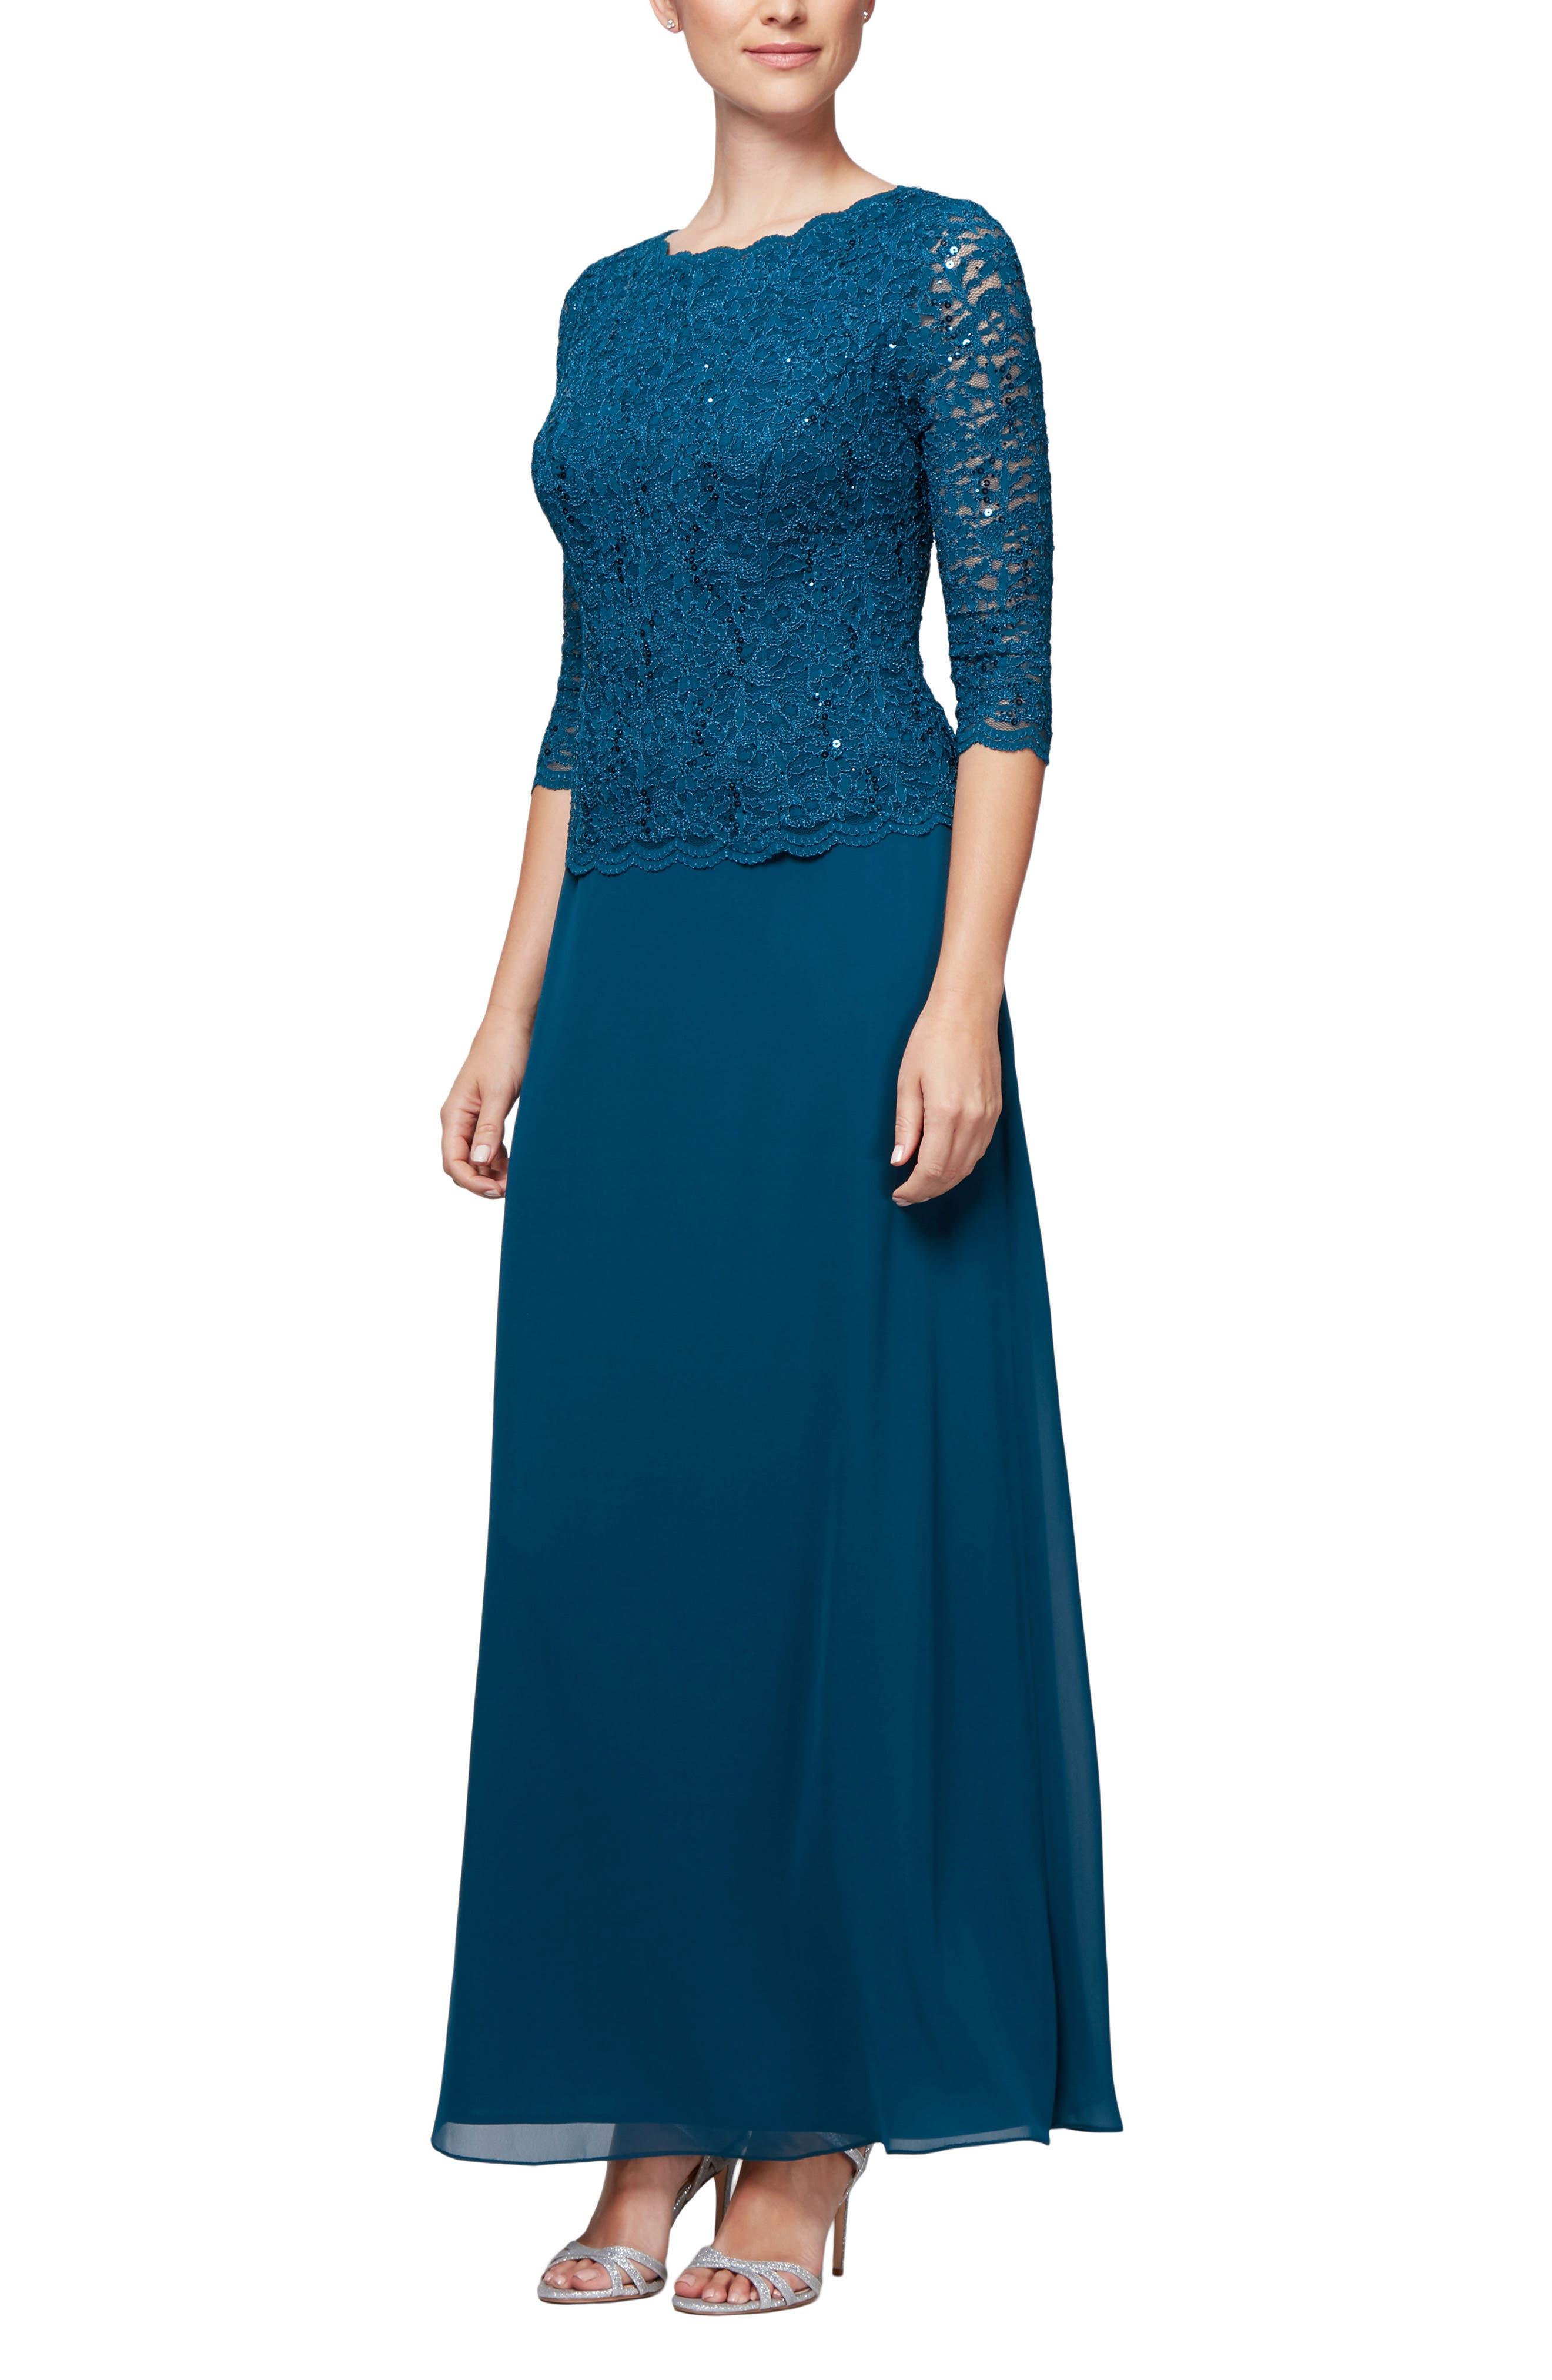 ALEX EVENINGS, Sequin Lace & Chiffon Gown, Main thumbnail 1, color, PEACOCK